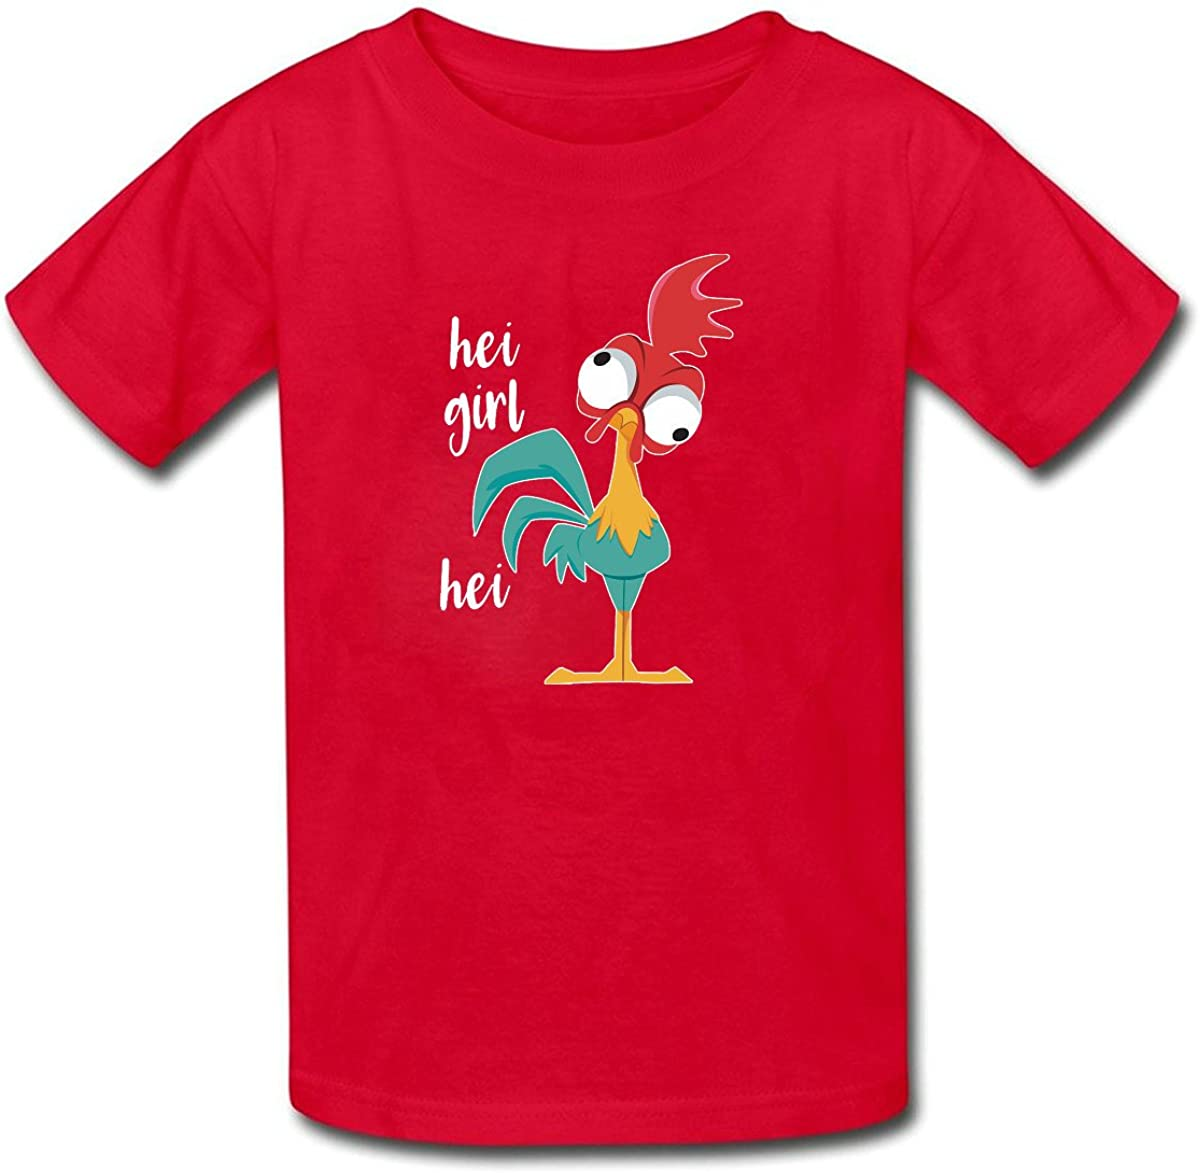 Kids T-Shirt Tops Black HEI Girl Unisex Youths Short Sleeve T-Shirt